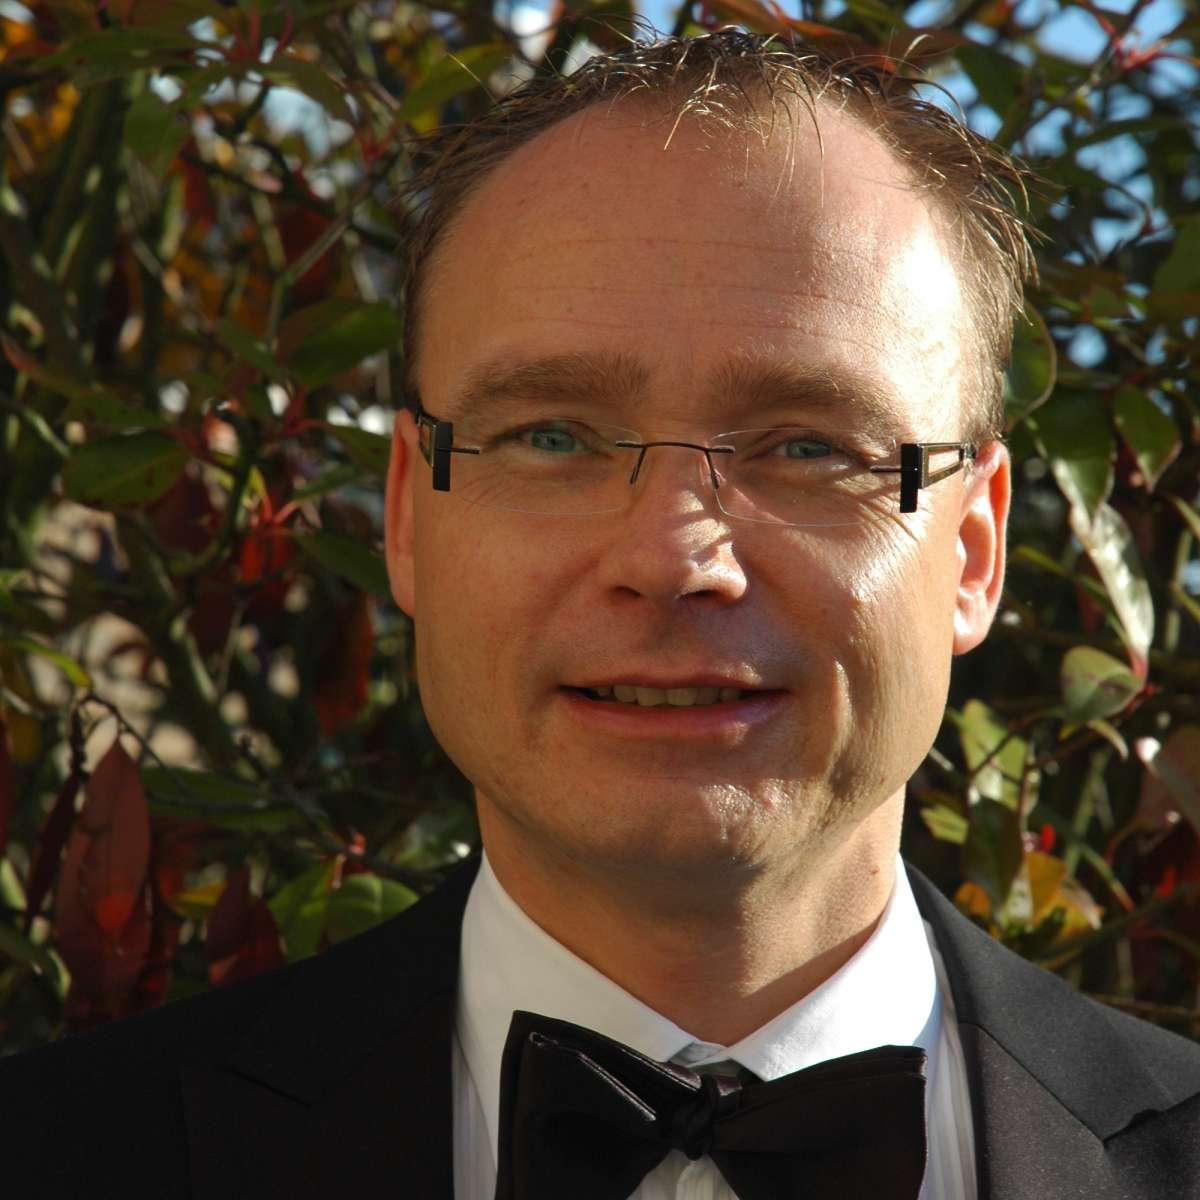 Iwan Wiering (trompet-docent)